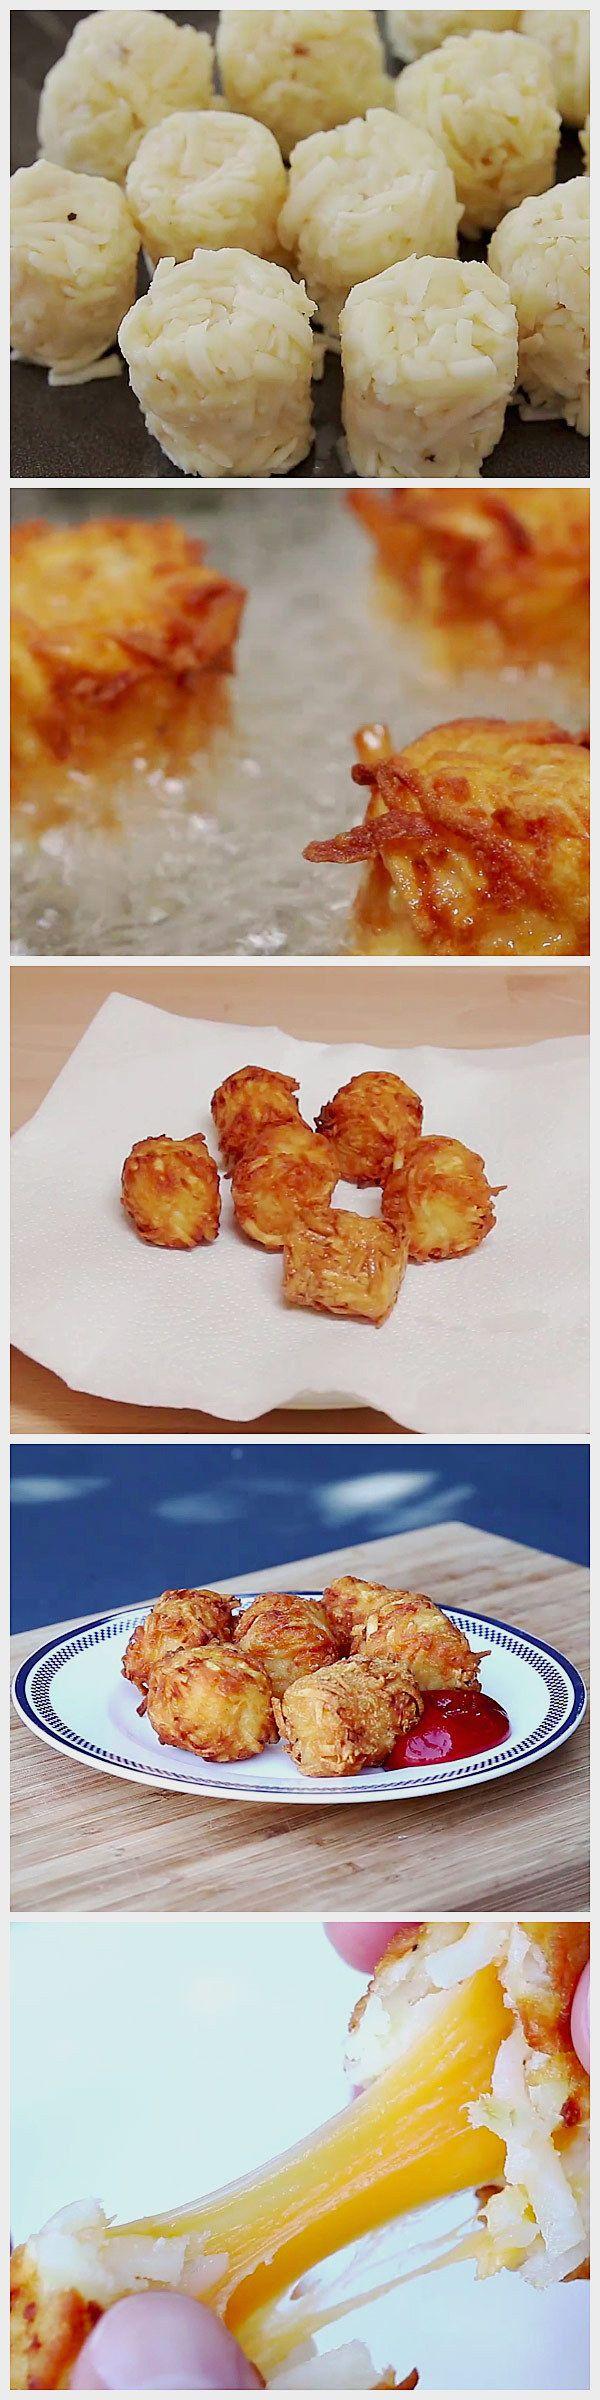 Bolitas de papa rellenas con queso.